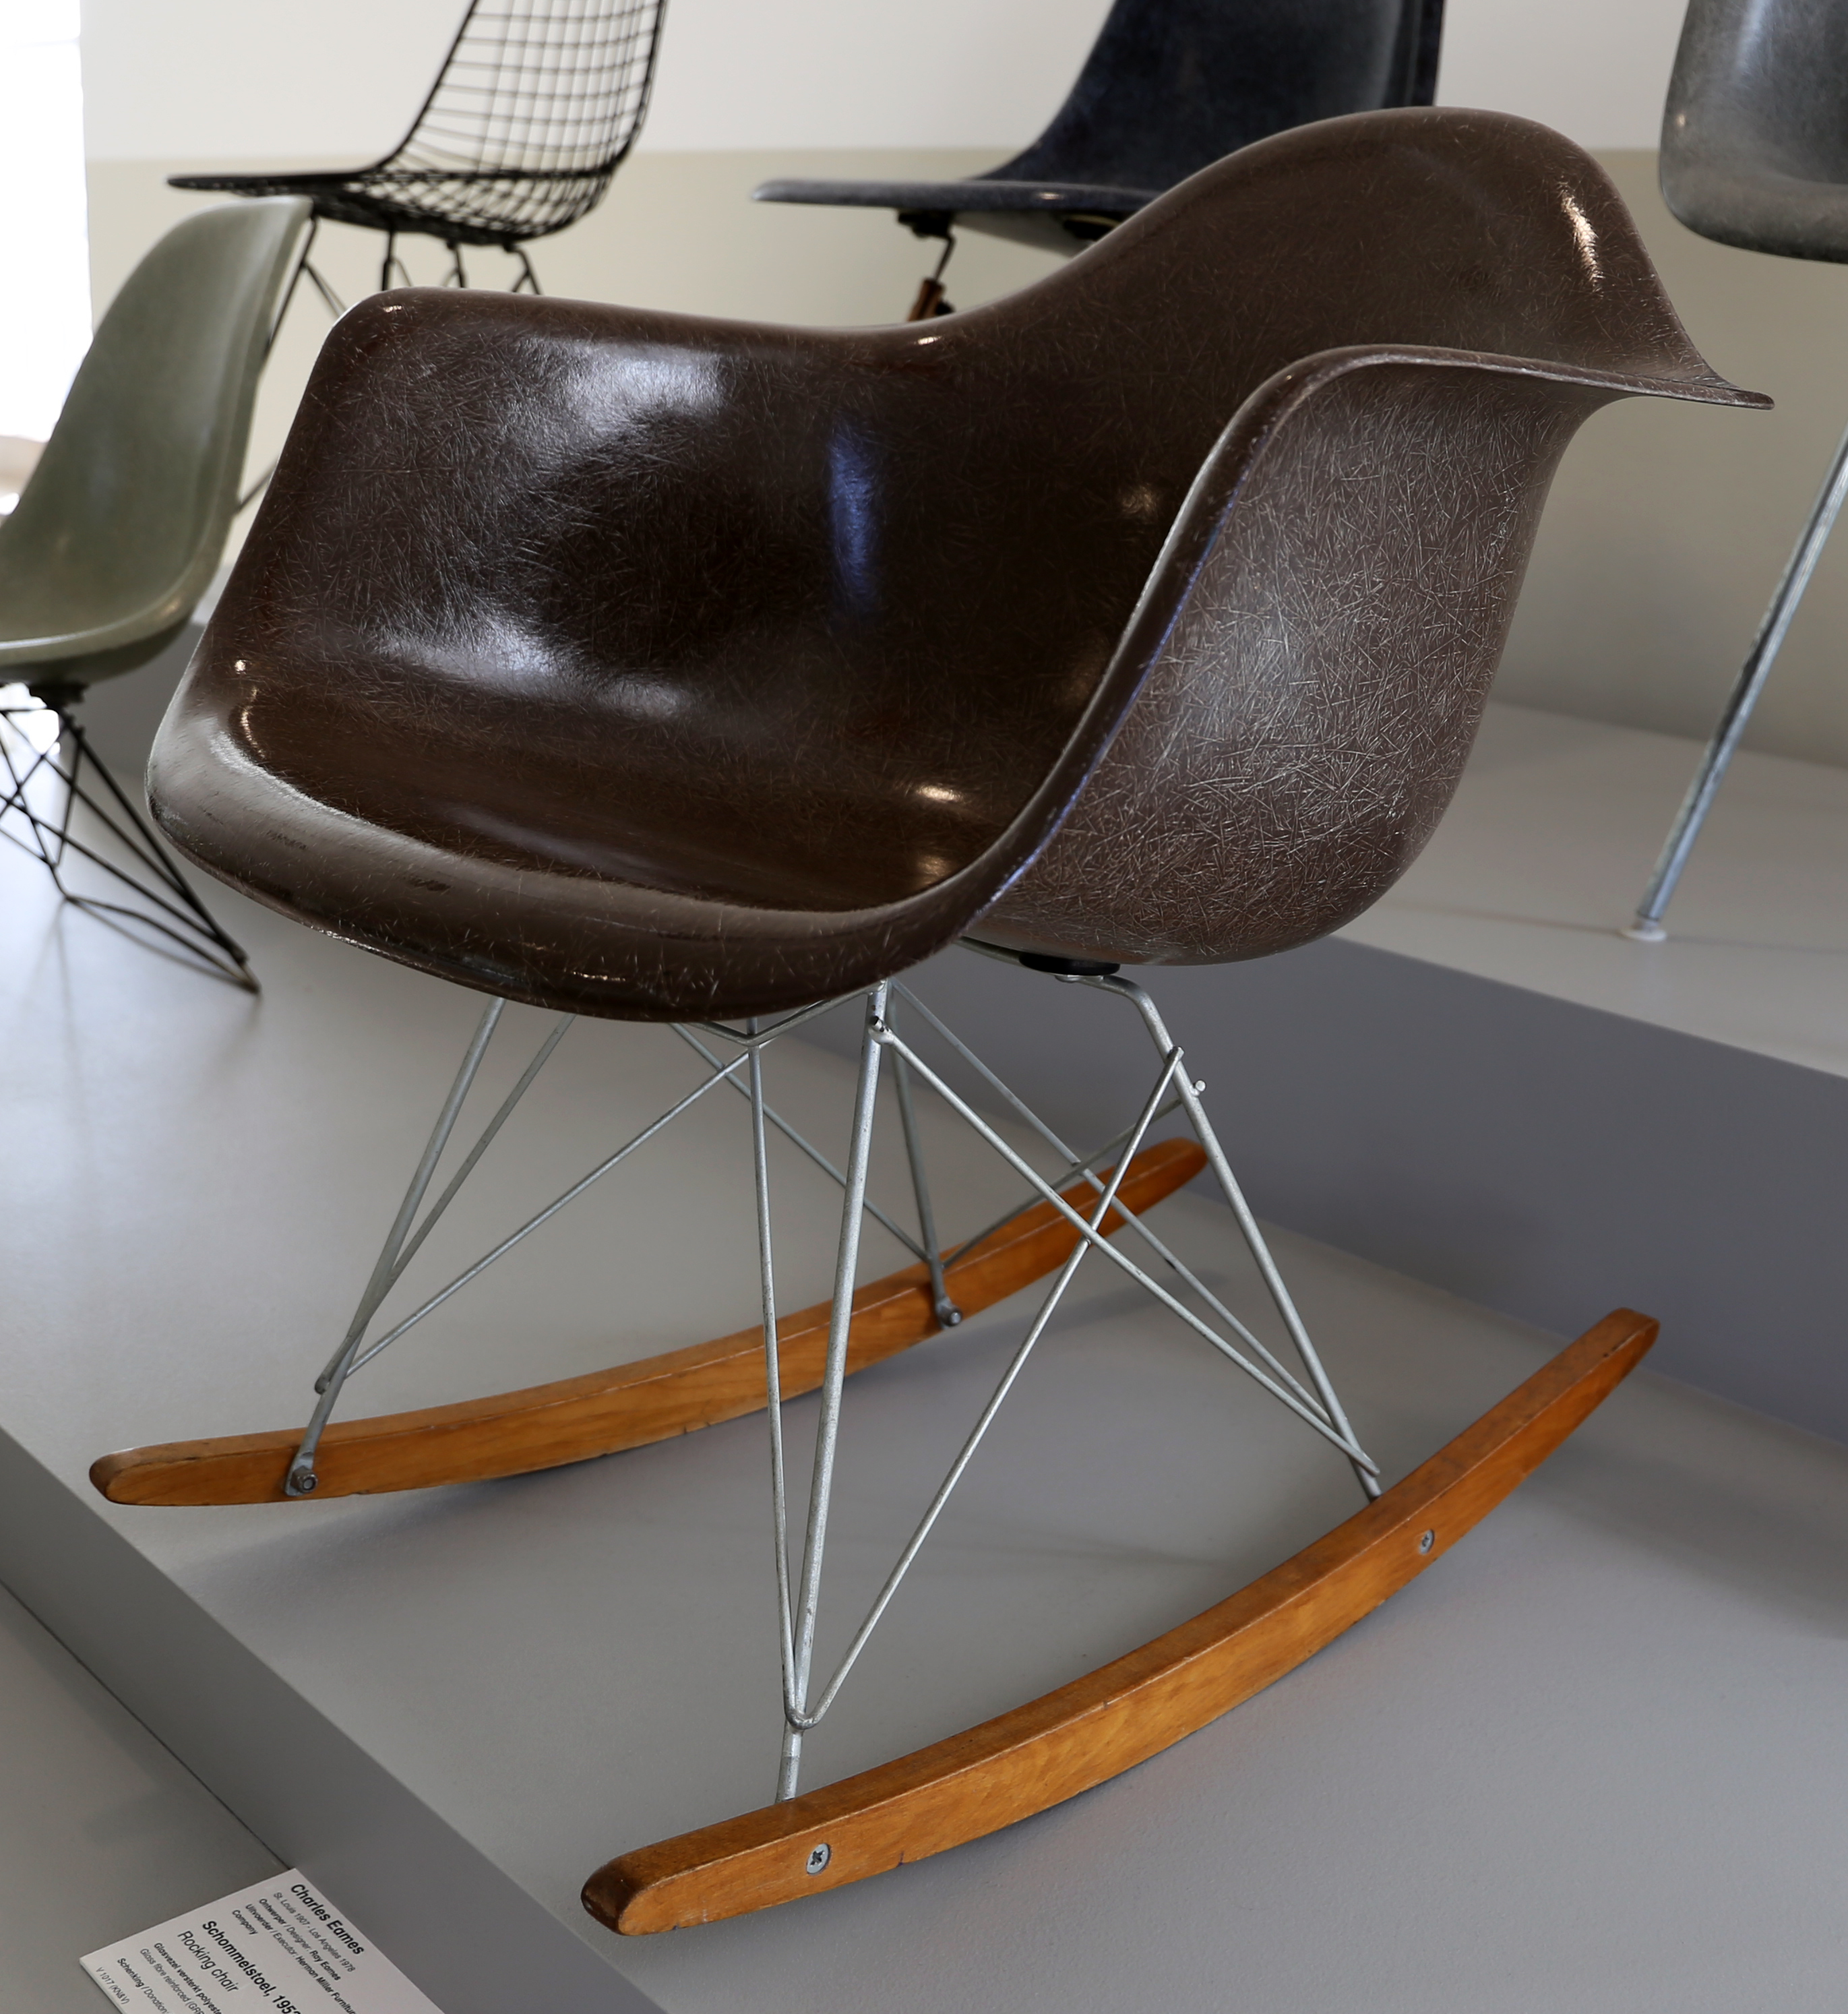 Sedia Dondolo Eames.File Charles Eames Per Herman Miller Furniture Sedia A